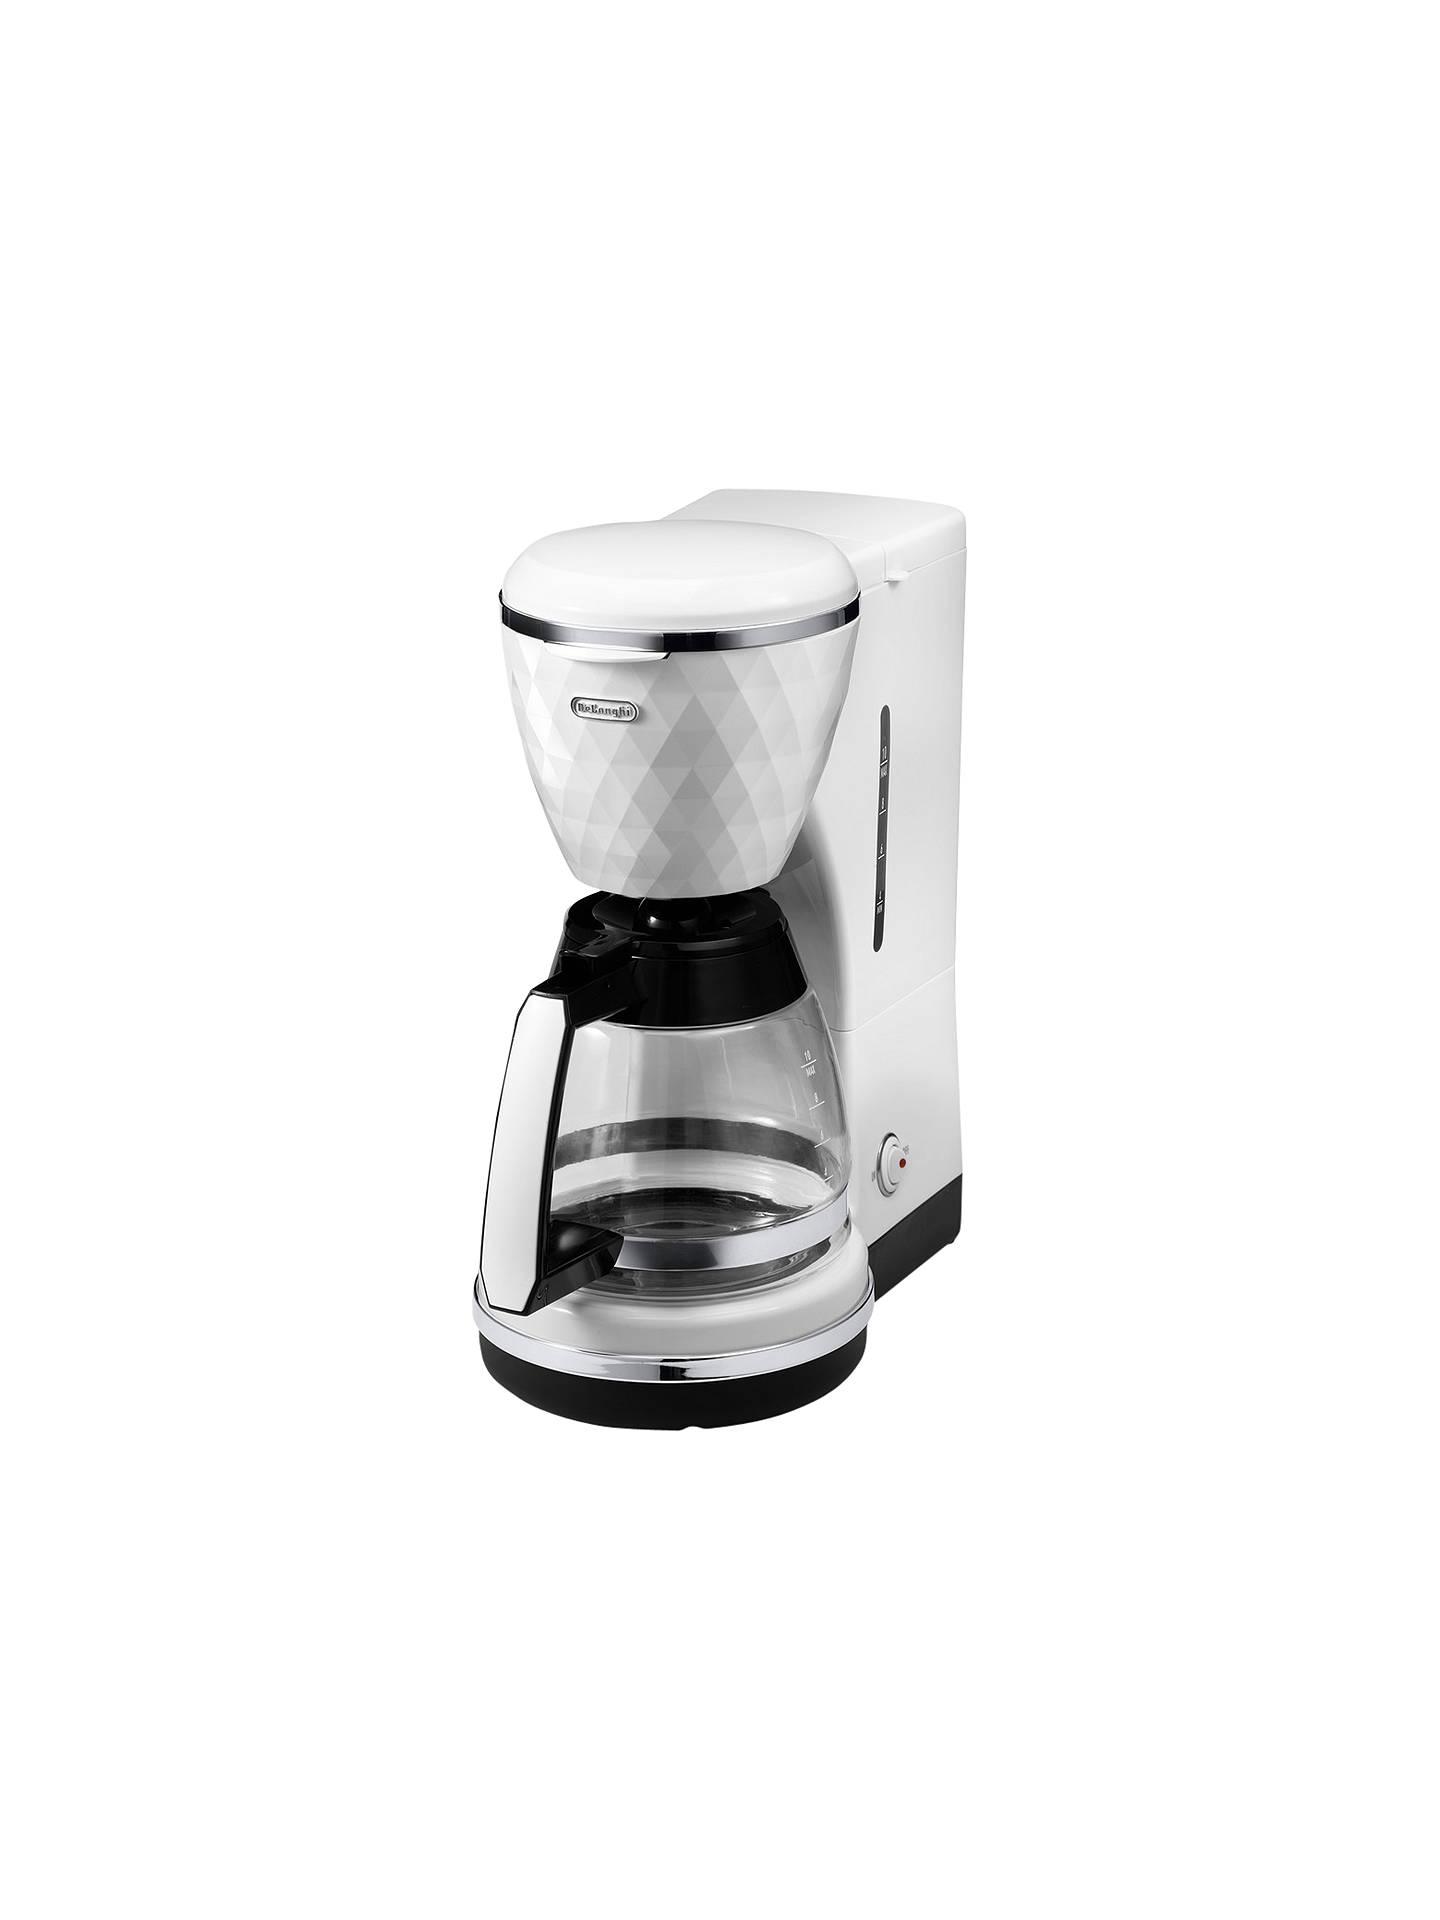 Delonghi Icmj210 Filter Coffee Maker White At John Lewis